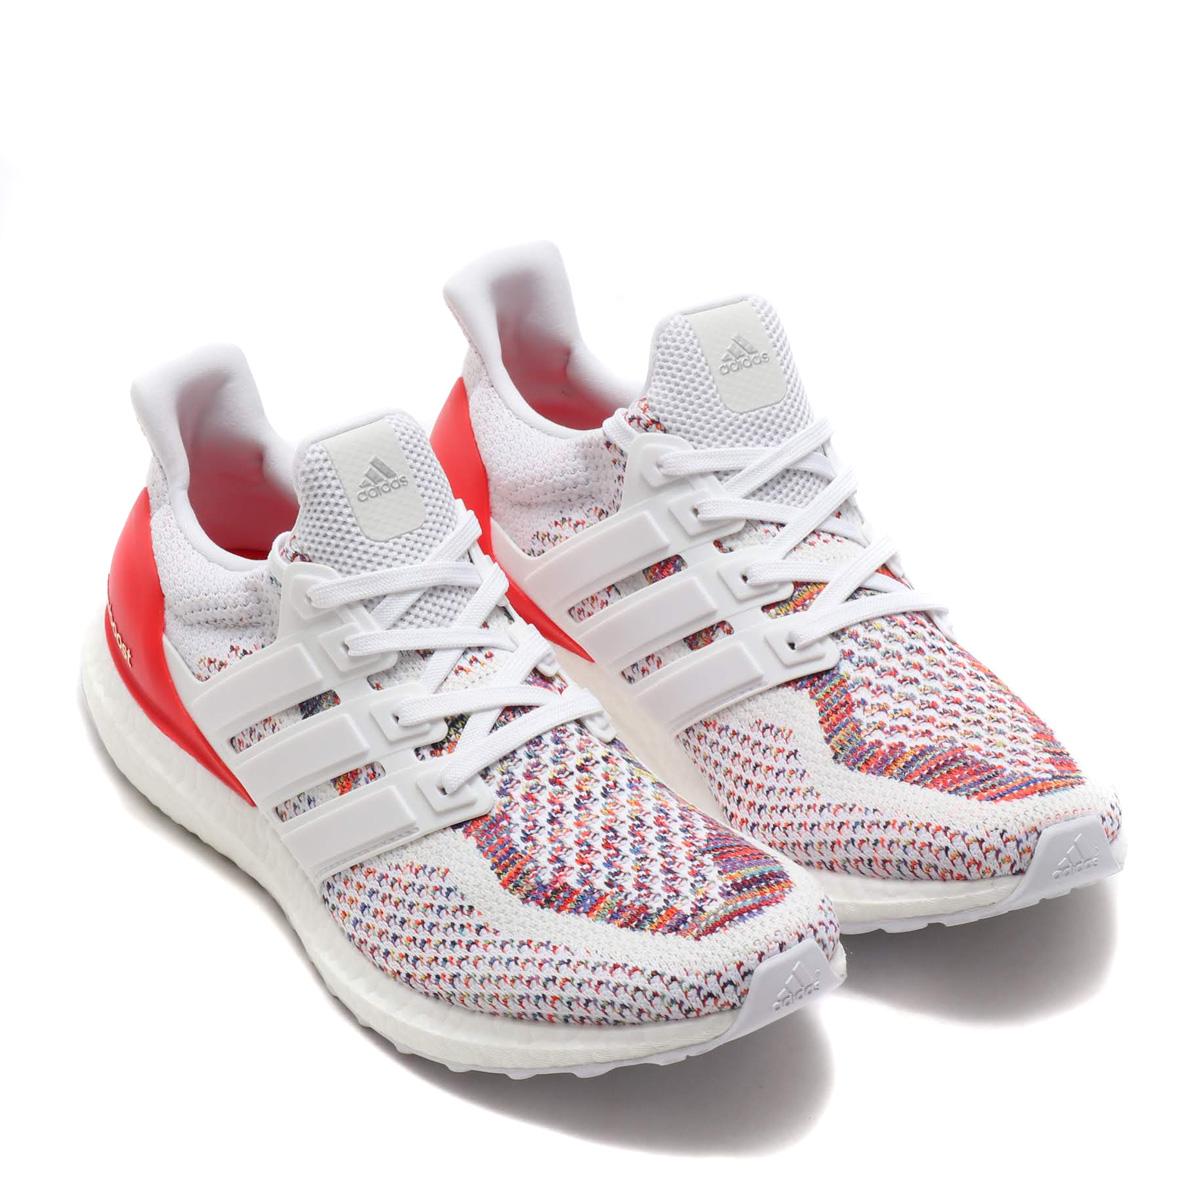 adidas UltraBOOST (Adidas ultra boost) RUNNING WHITERUNNING WHITERED 18FW I